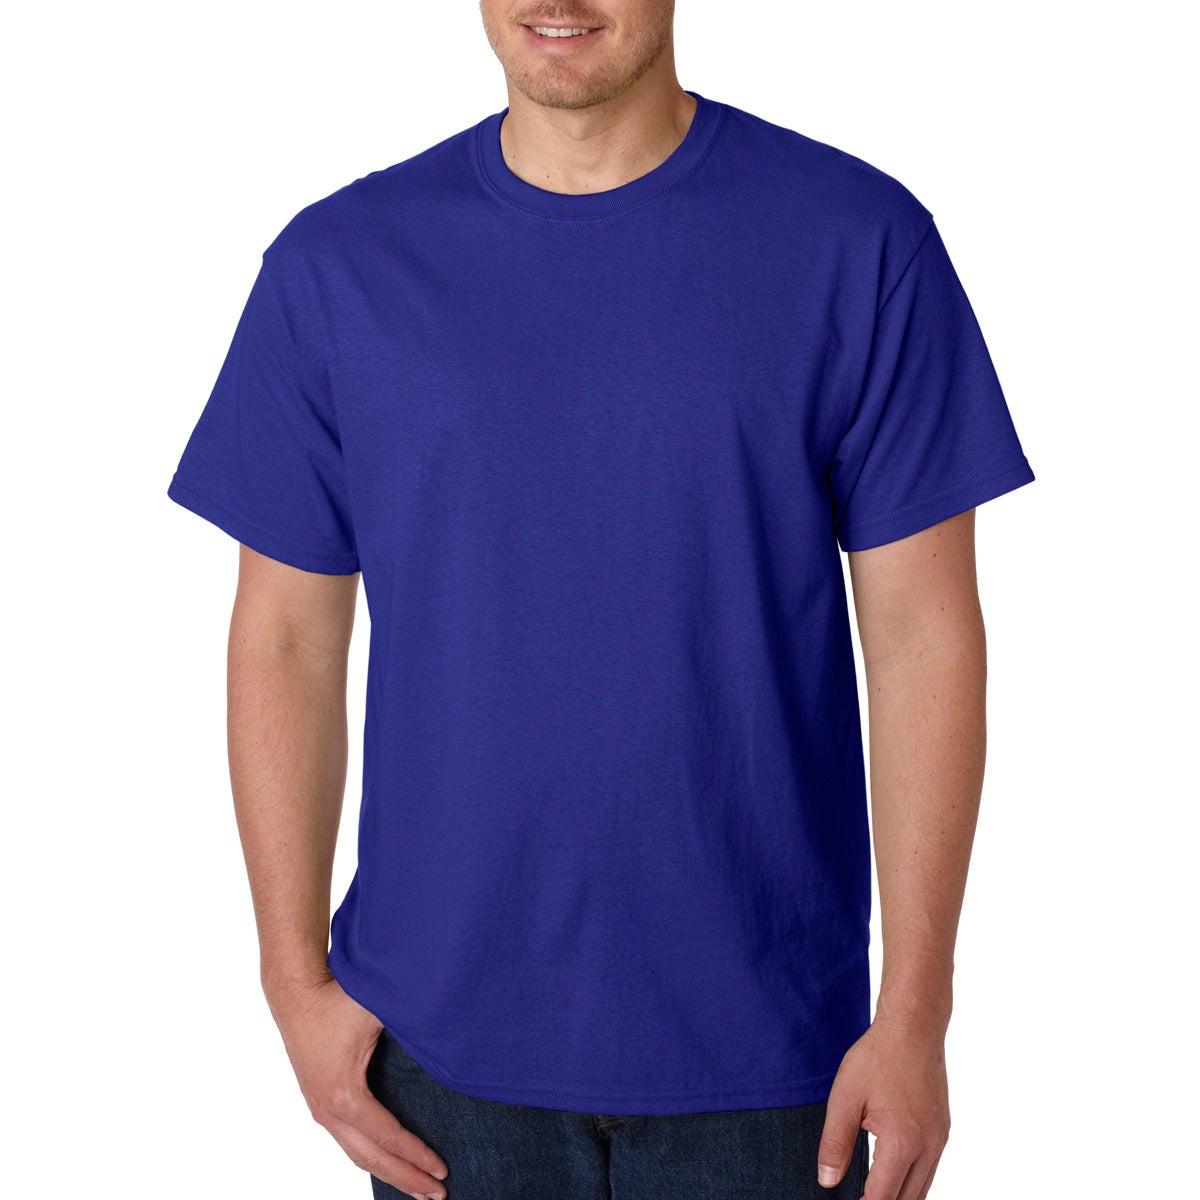 Gildan adult heavy cotton t shirt colors 100 cotton t for Custom t shirts gildan